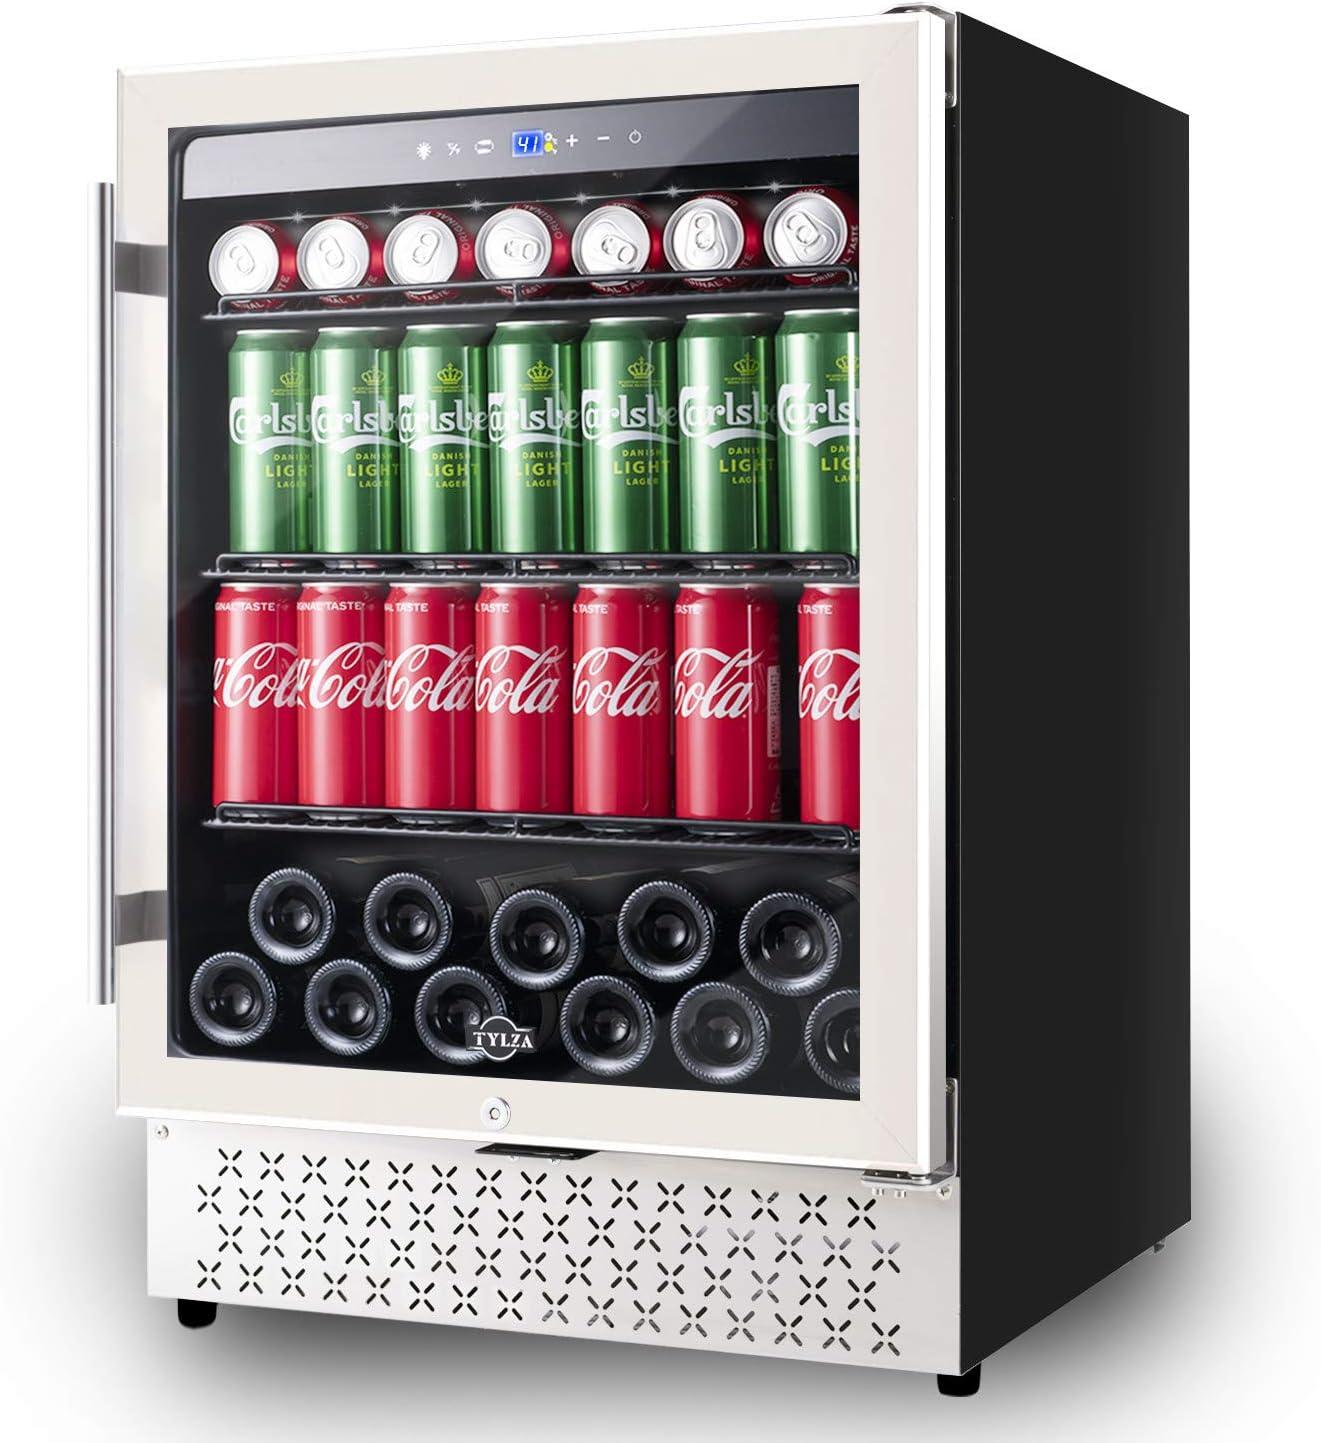 Beverage Refrigerator 24 Inch, 190 Can Built-in or Freestanding Beverage Cooler, Mini Fridge with Glass Door Drink Beer Fridge for Beer, Soda or Wine, LOW NOISE, 37-64℉